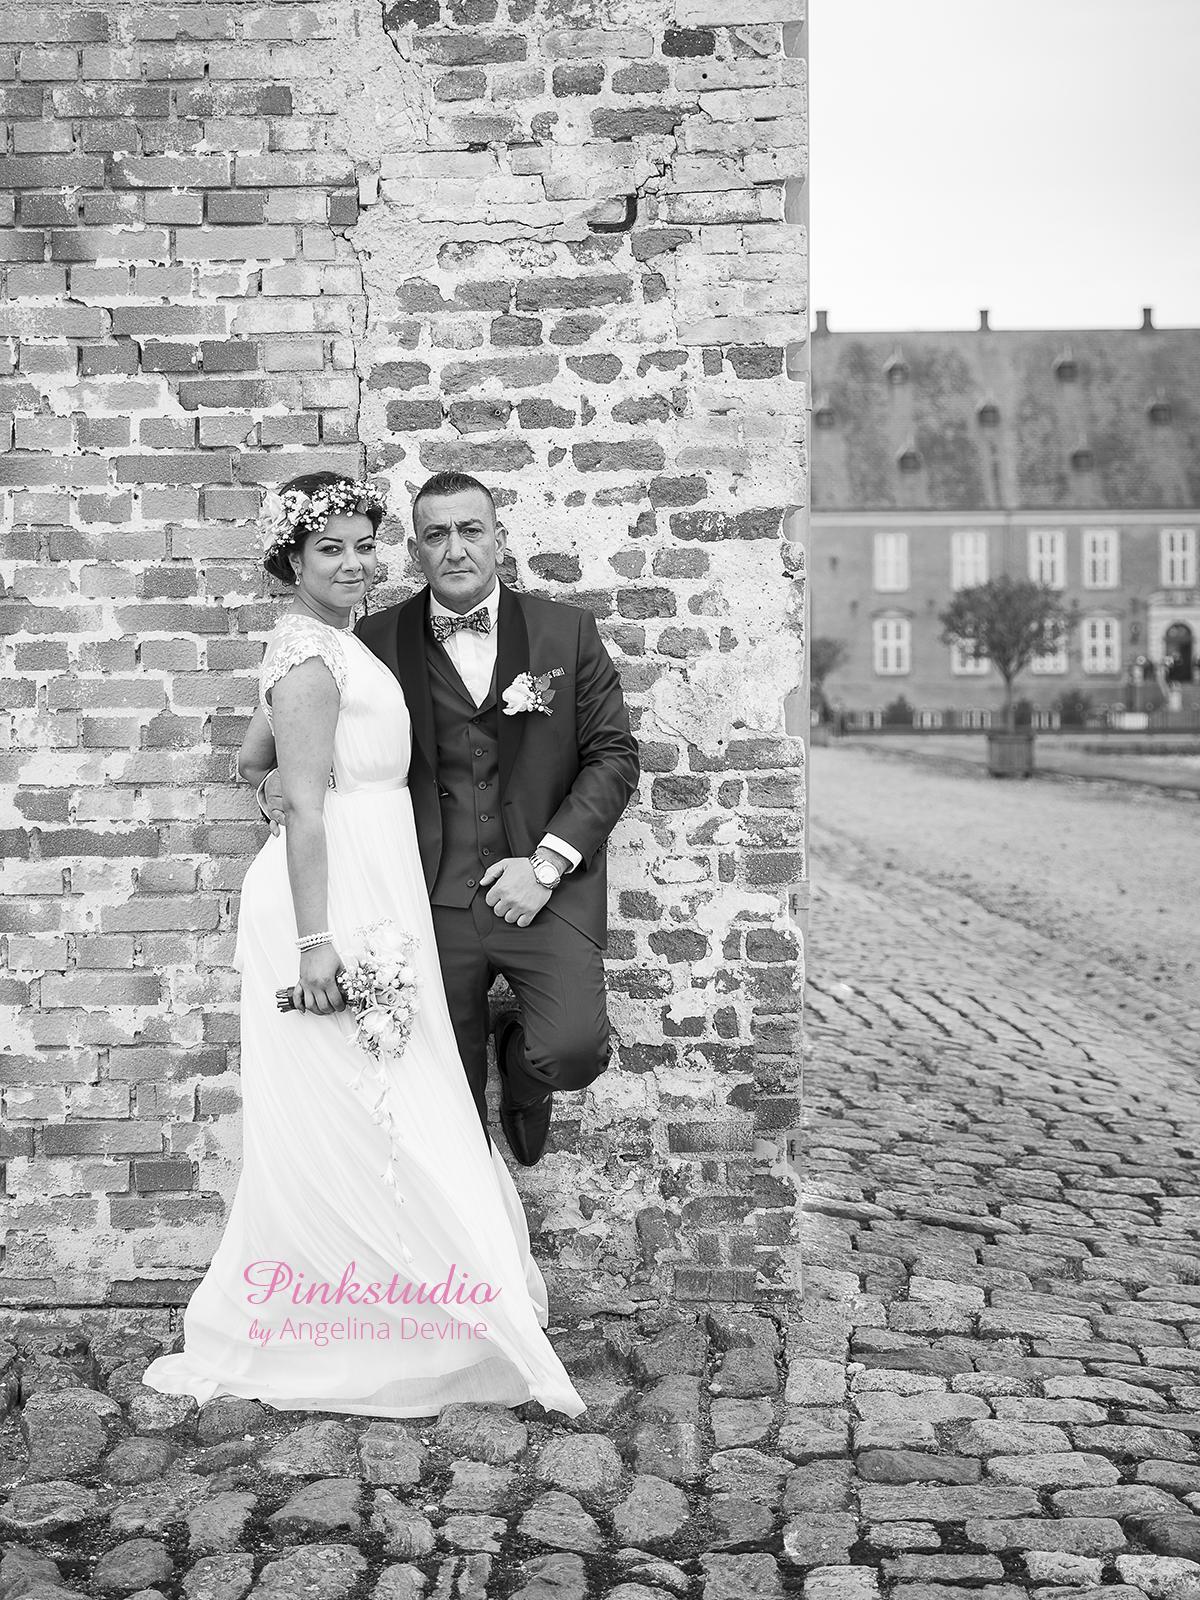 bryllups- og portræt fotograf